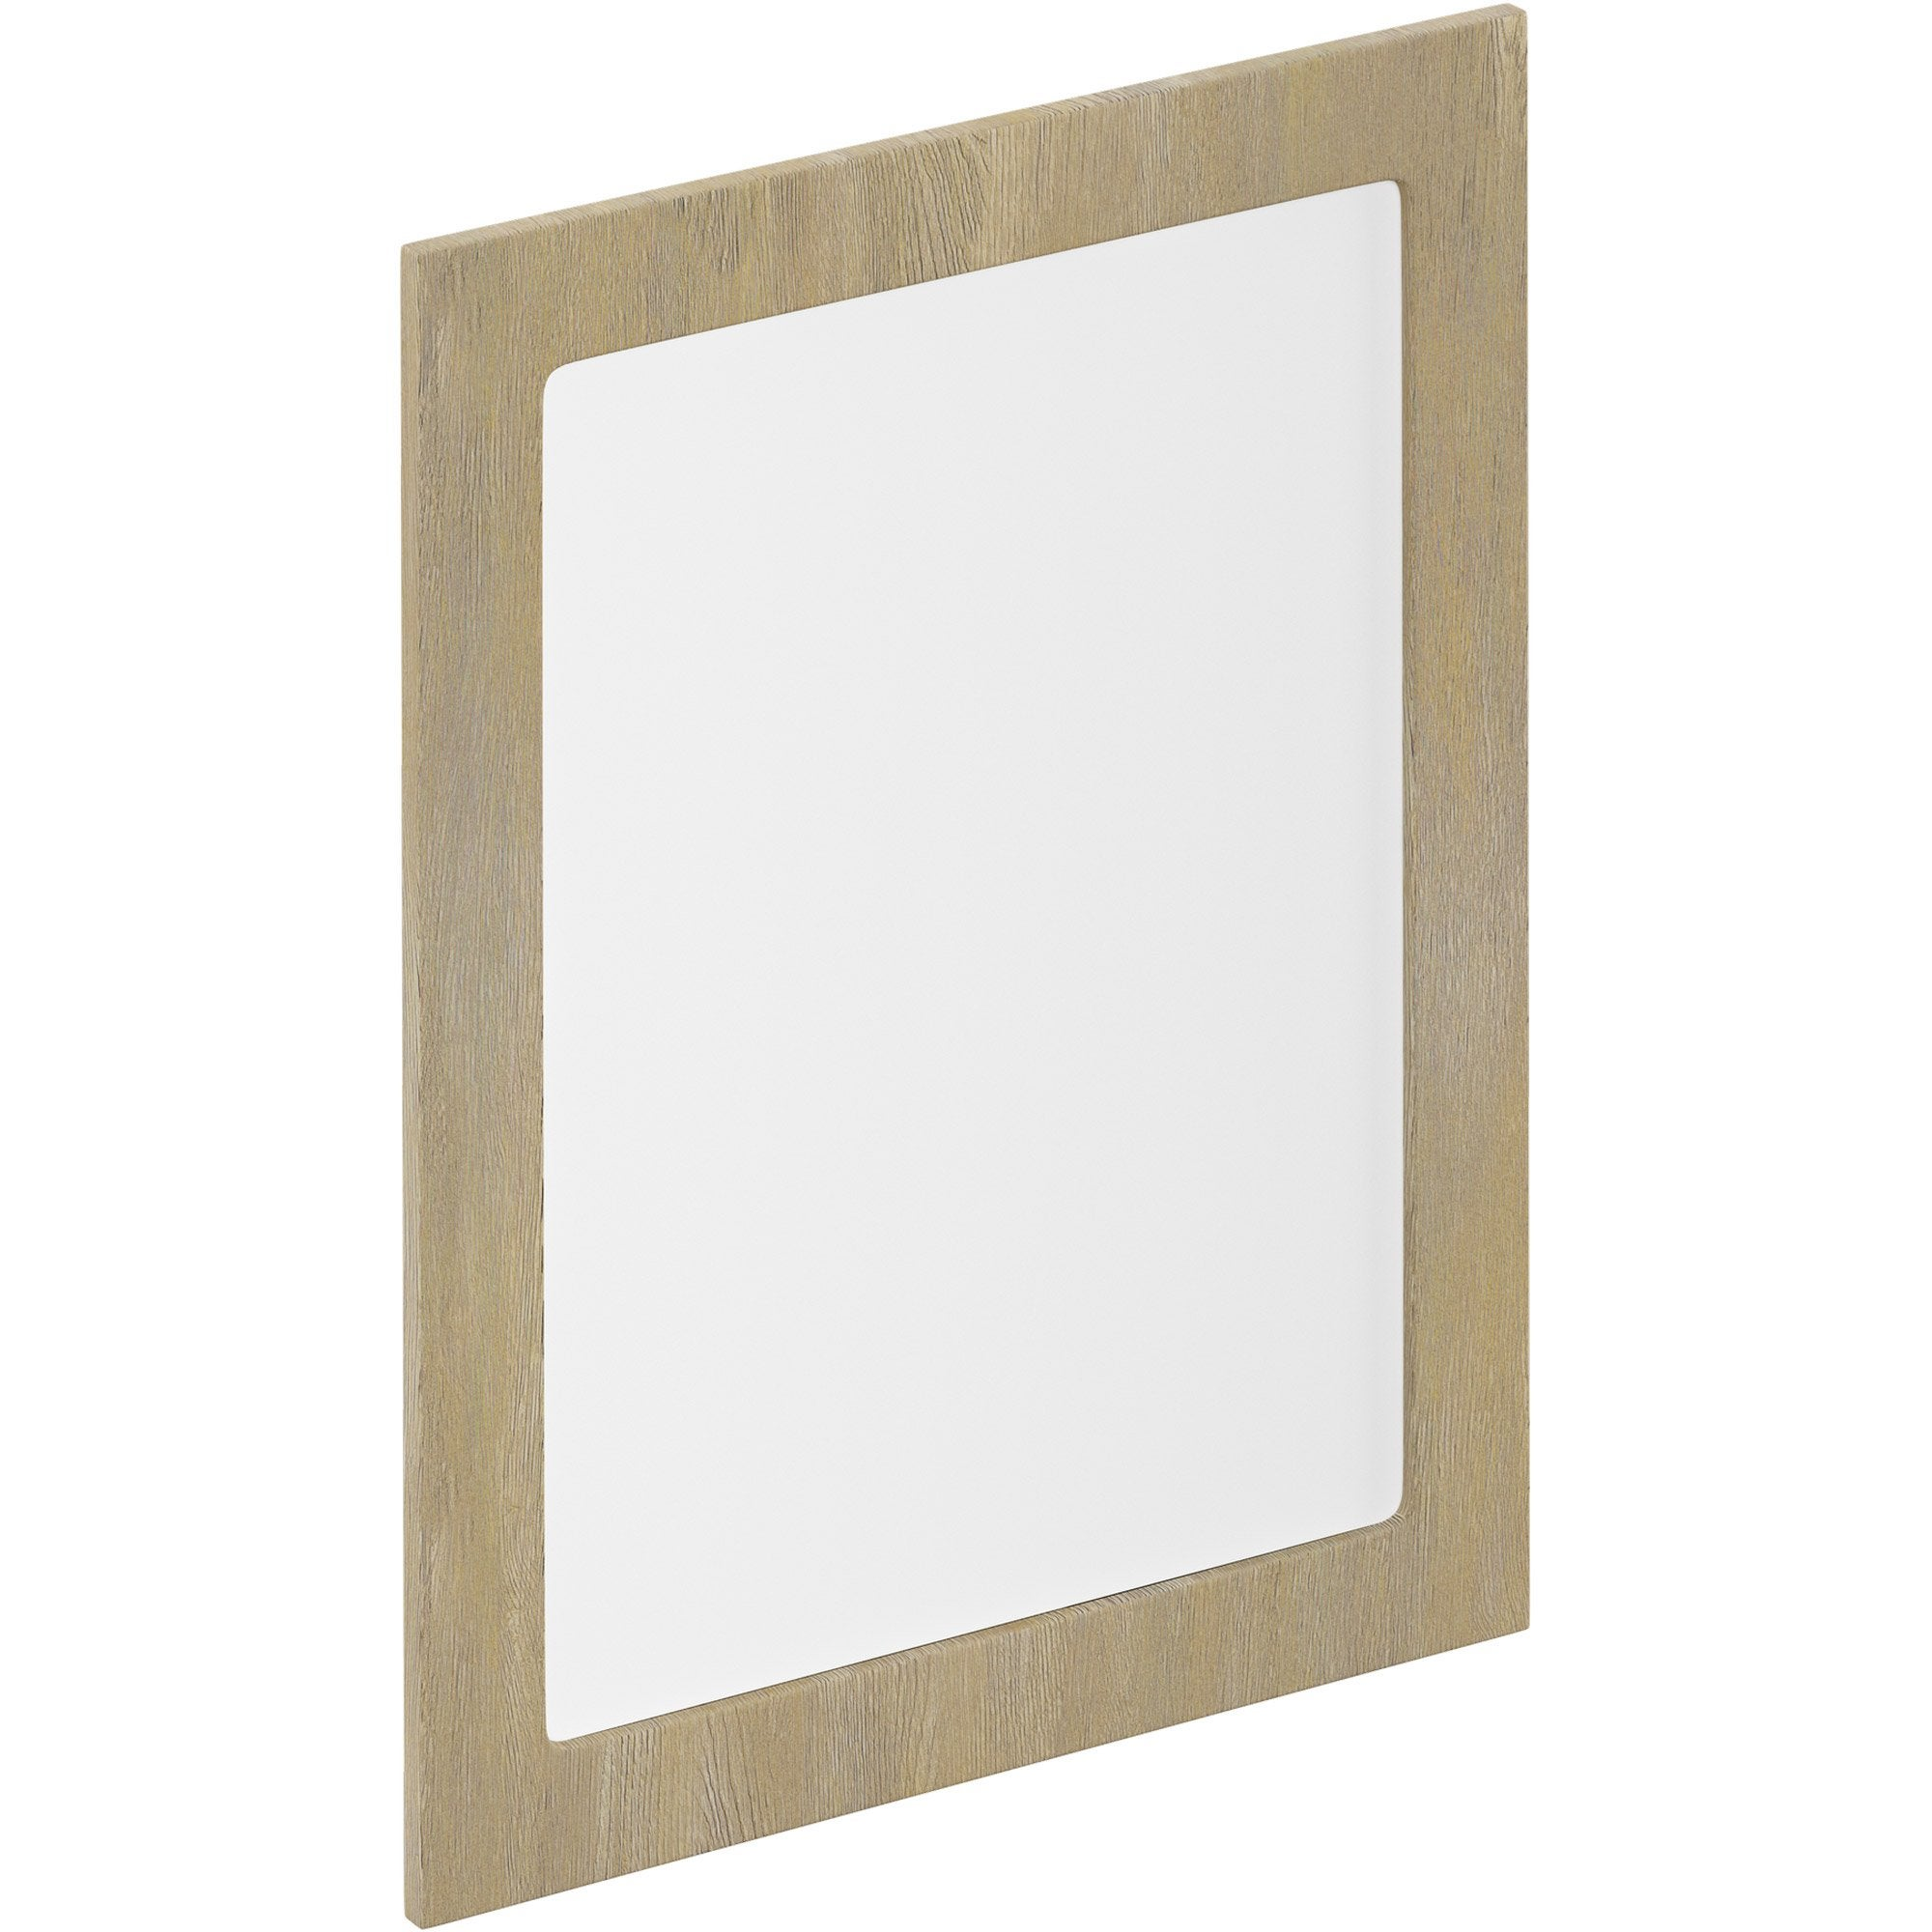 Porte de cuisine vitr e sevilla effet bois rough delinia id x cm leroy merlin - Porte de cuisine vitree ...